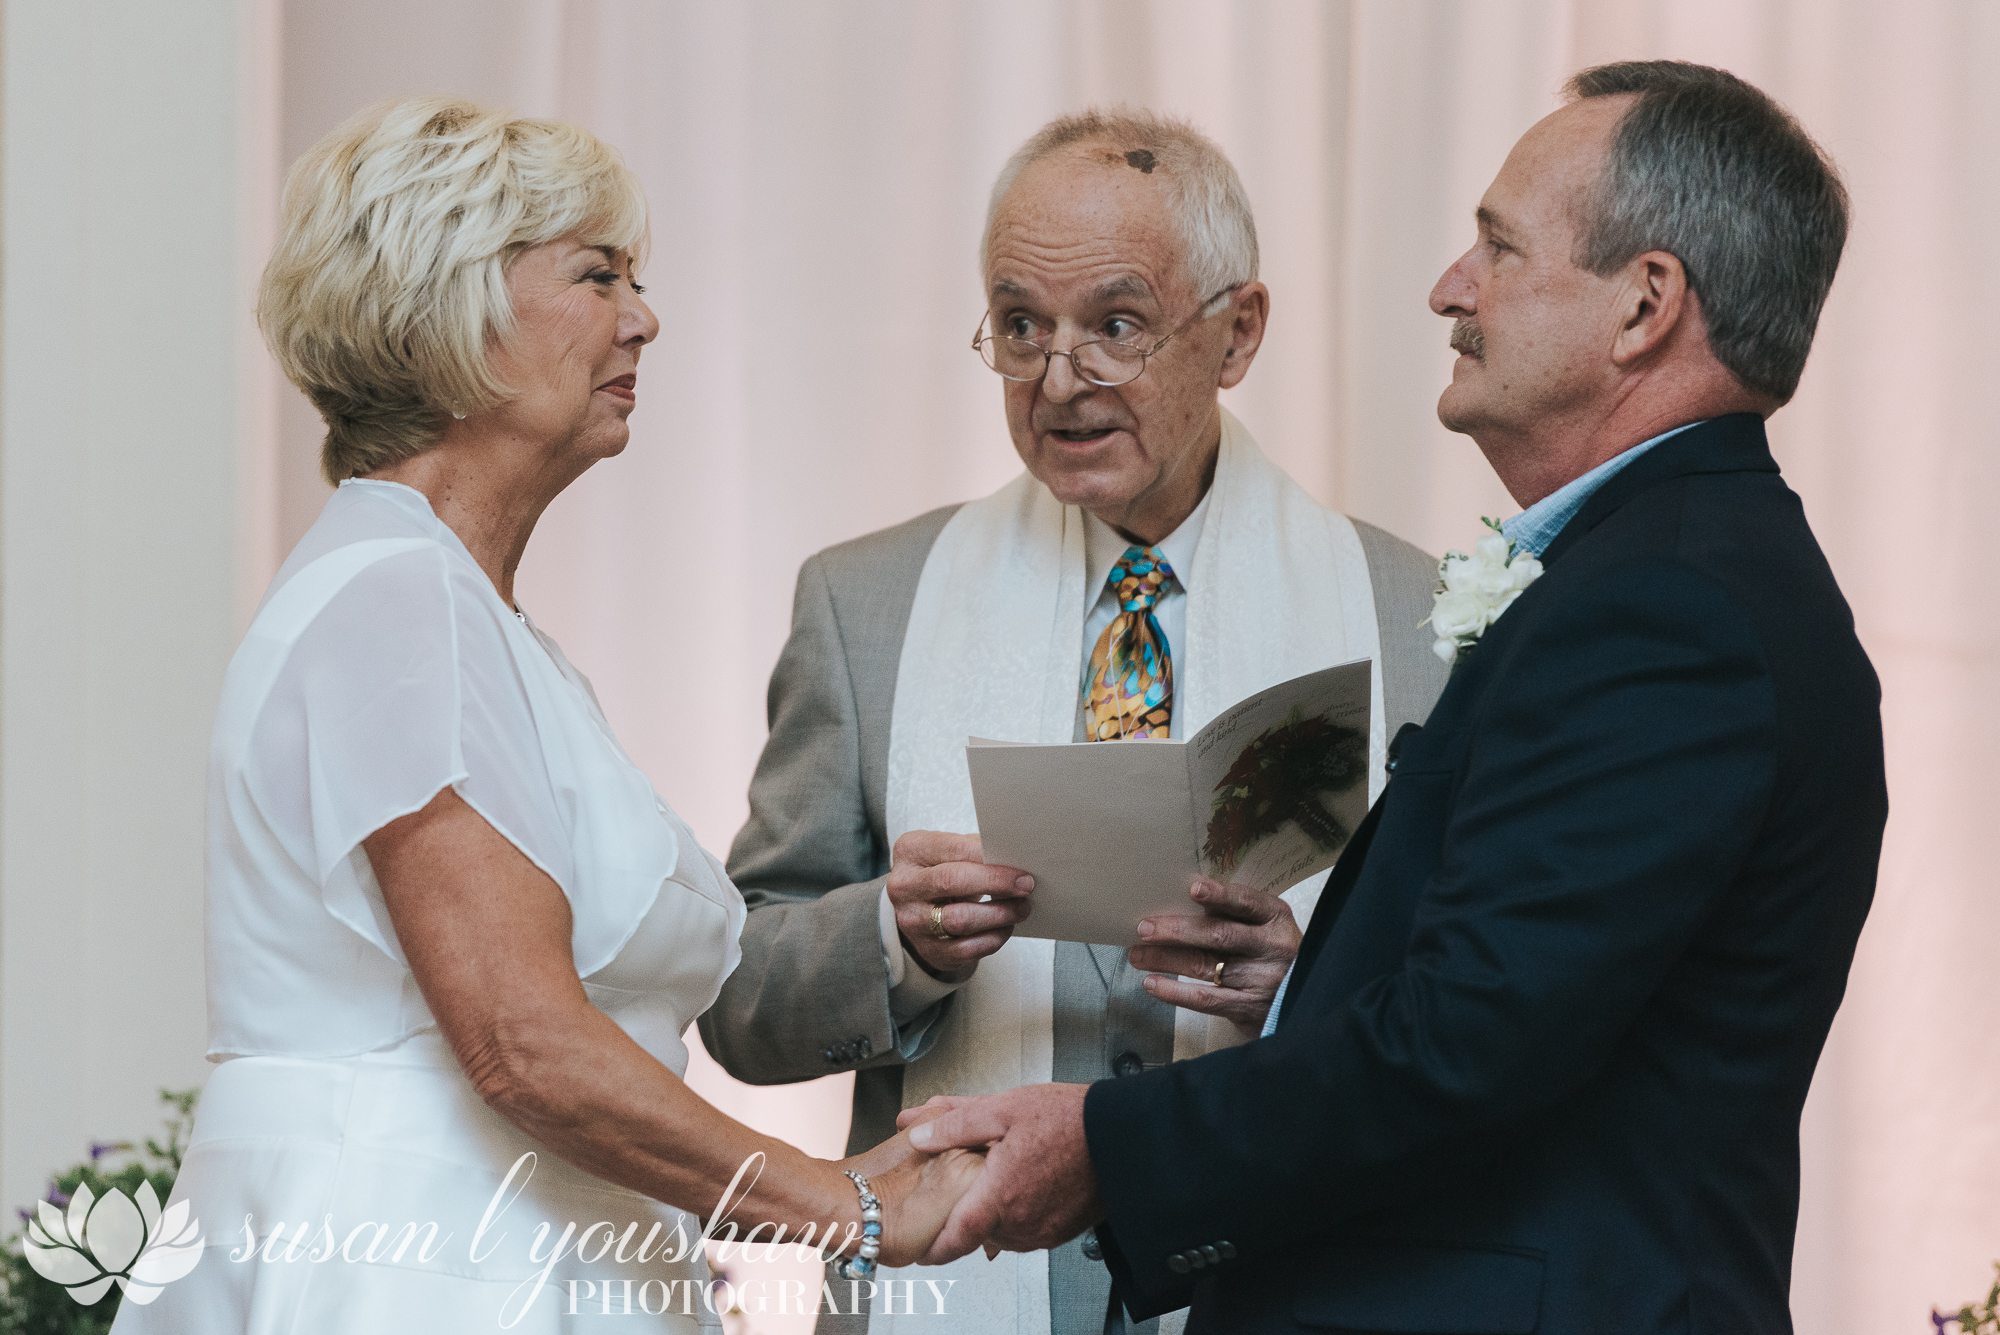 BLOG Carolyn Adams and Jim McCune 07-04-2018 SLY Photography-79.jpg